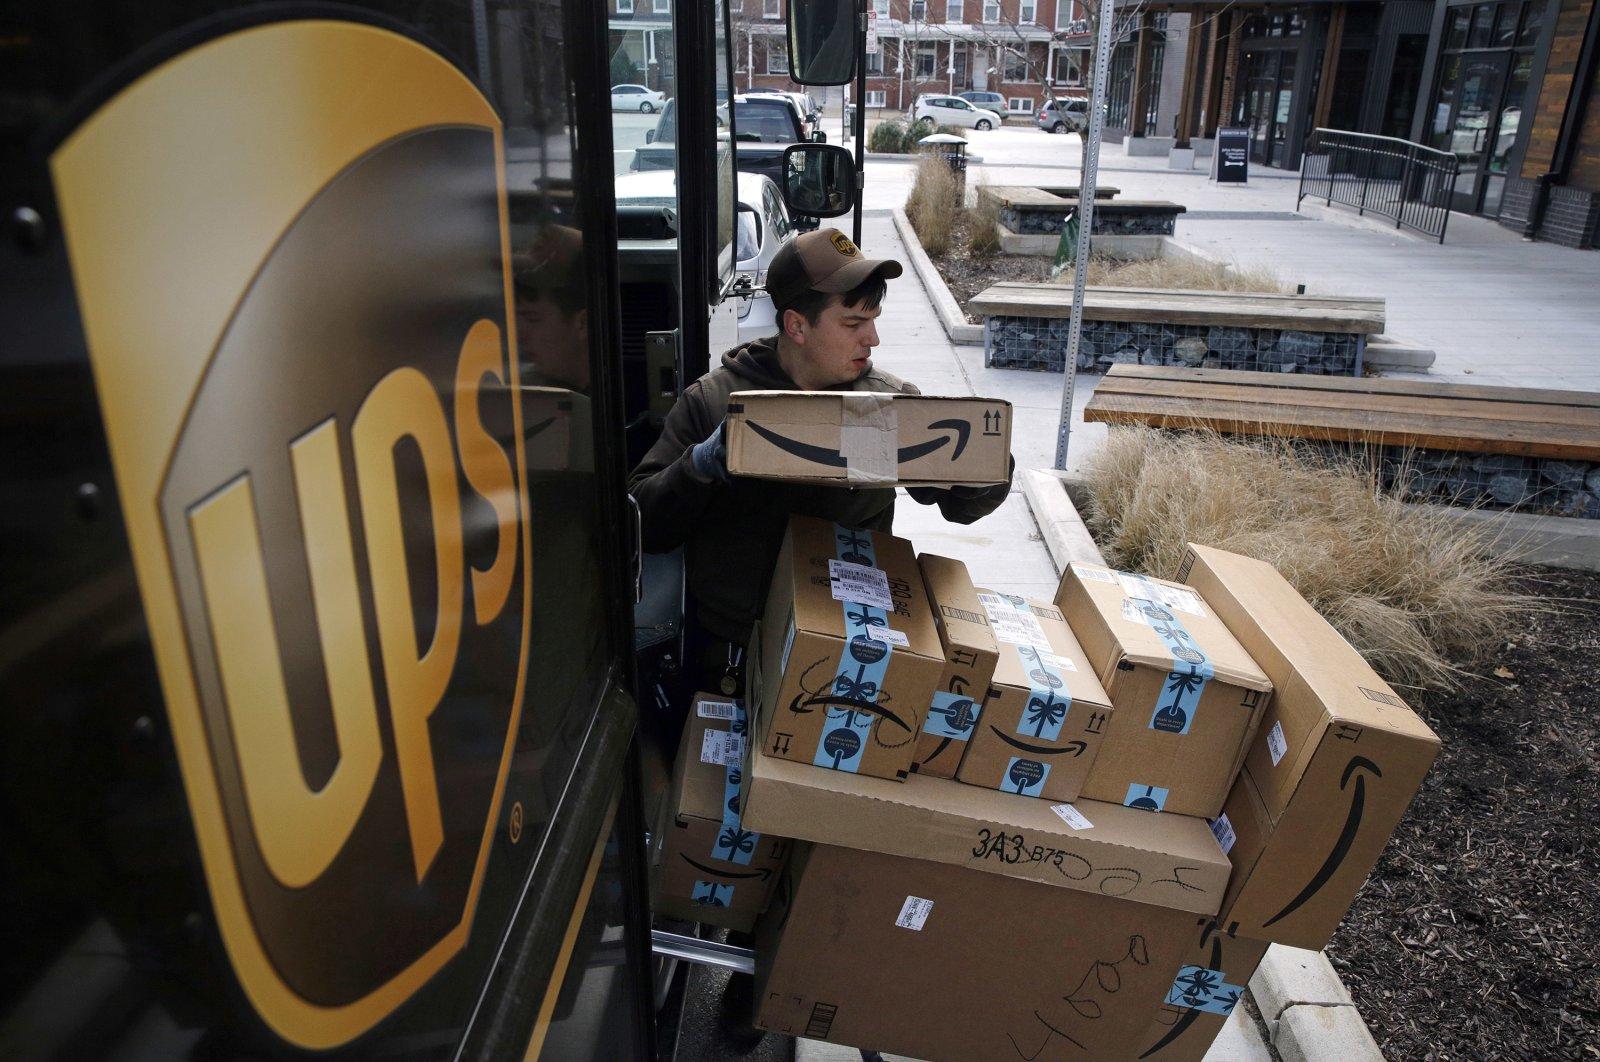 A UPS driver prepares to deliver packages, Dec. 19, 2018. (AP Photo)